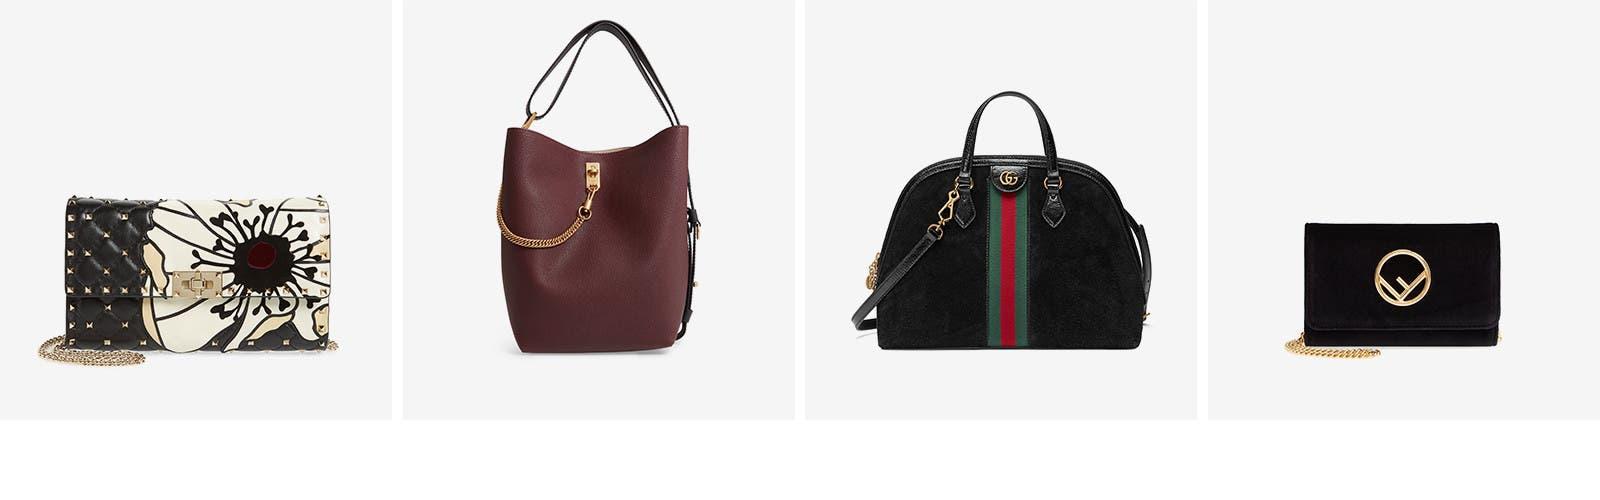 Designer crossbodies, totes, satchels and more handbags and wallets.